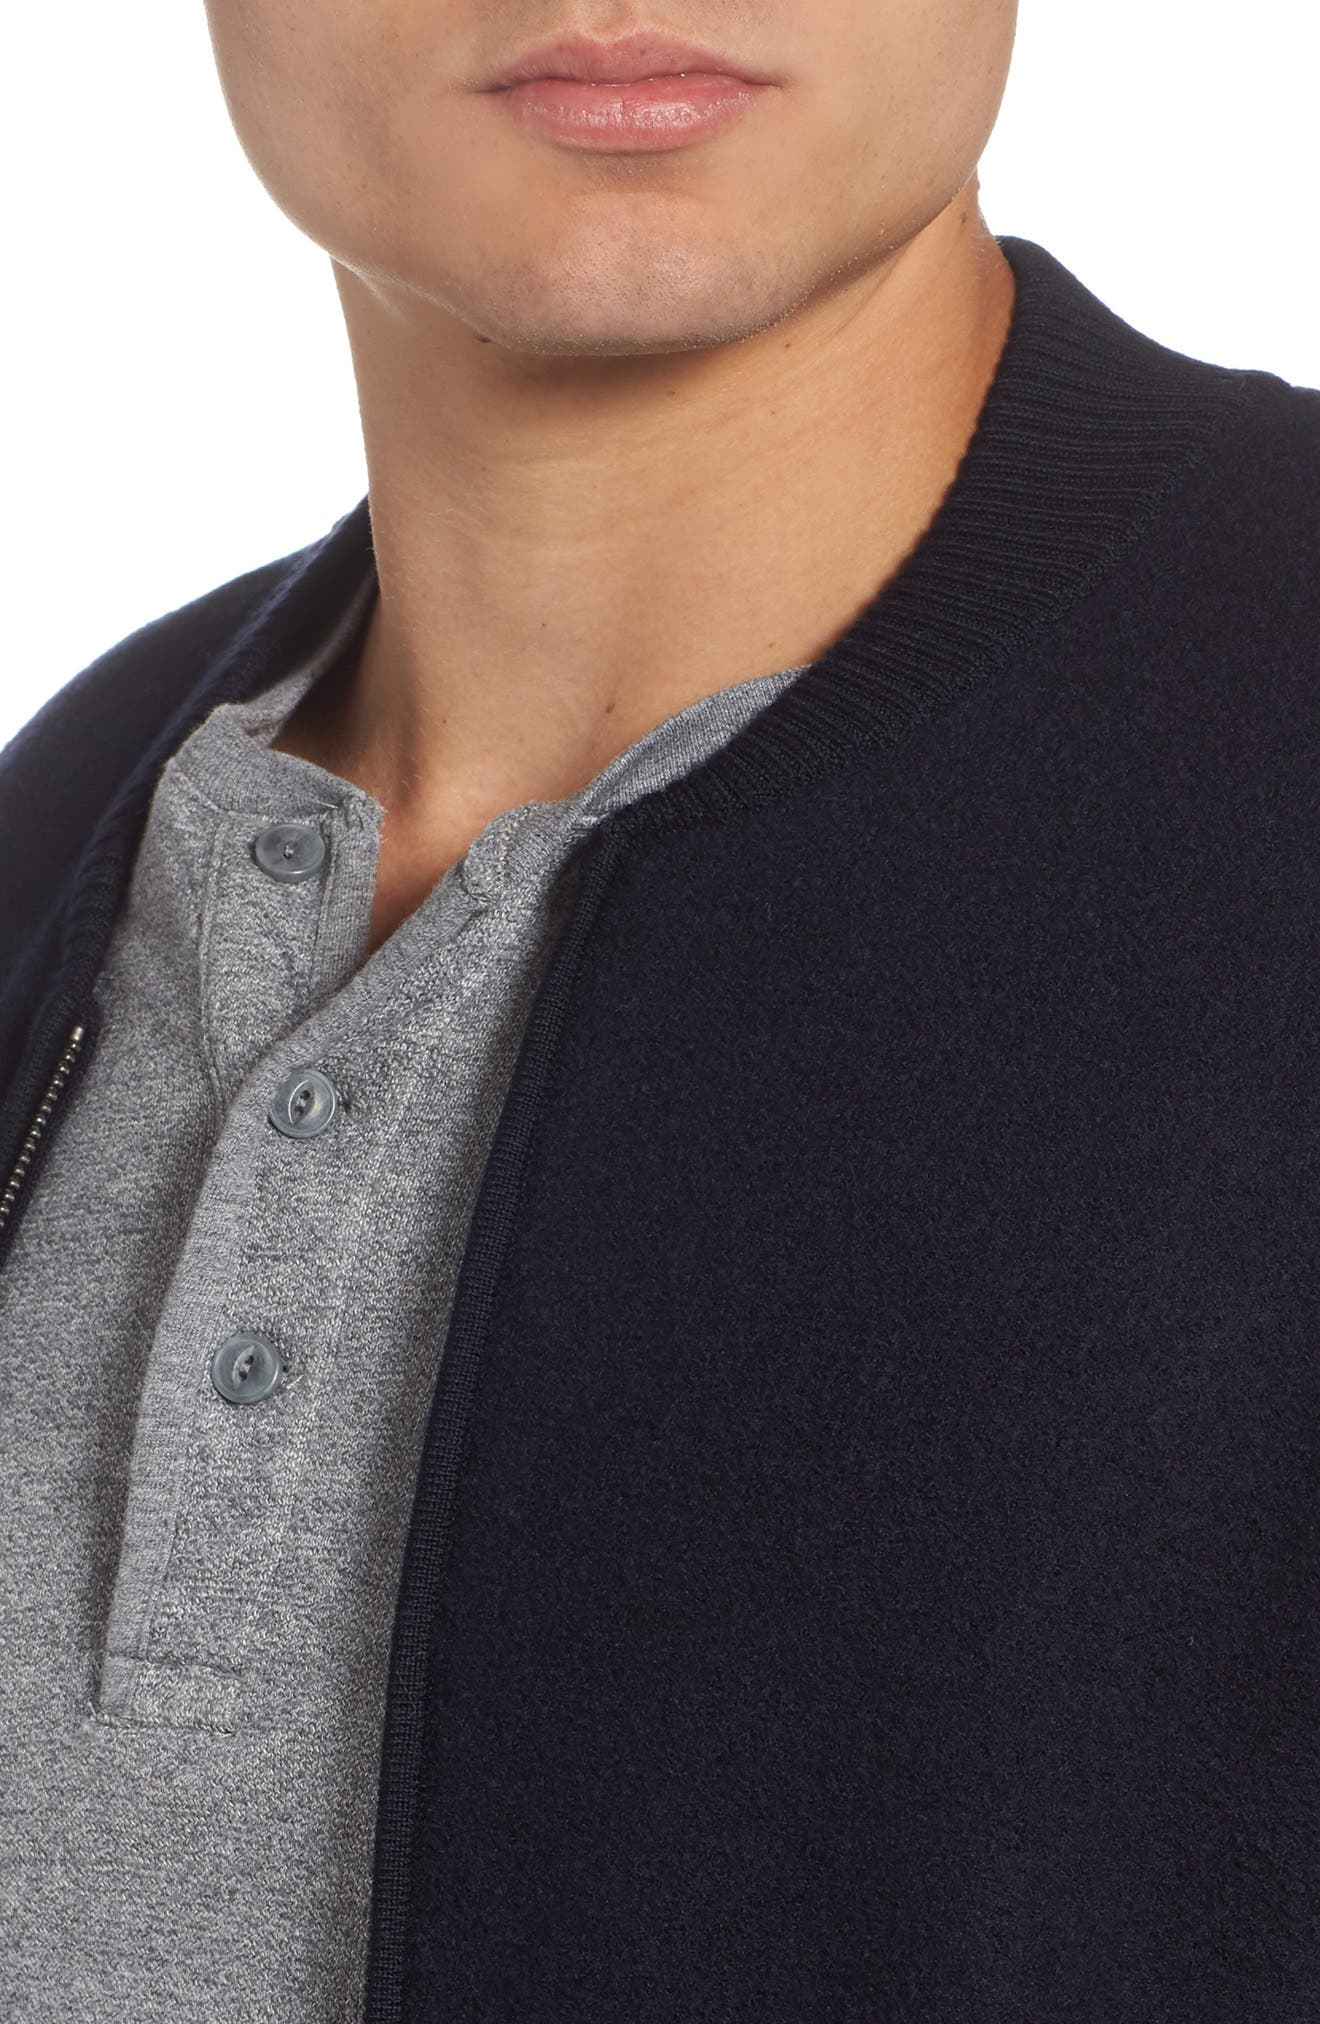 Felted Wool Bomber Jacket,                             Alternate thumbnail 4, color,                             BLUE GRAPHITE